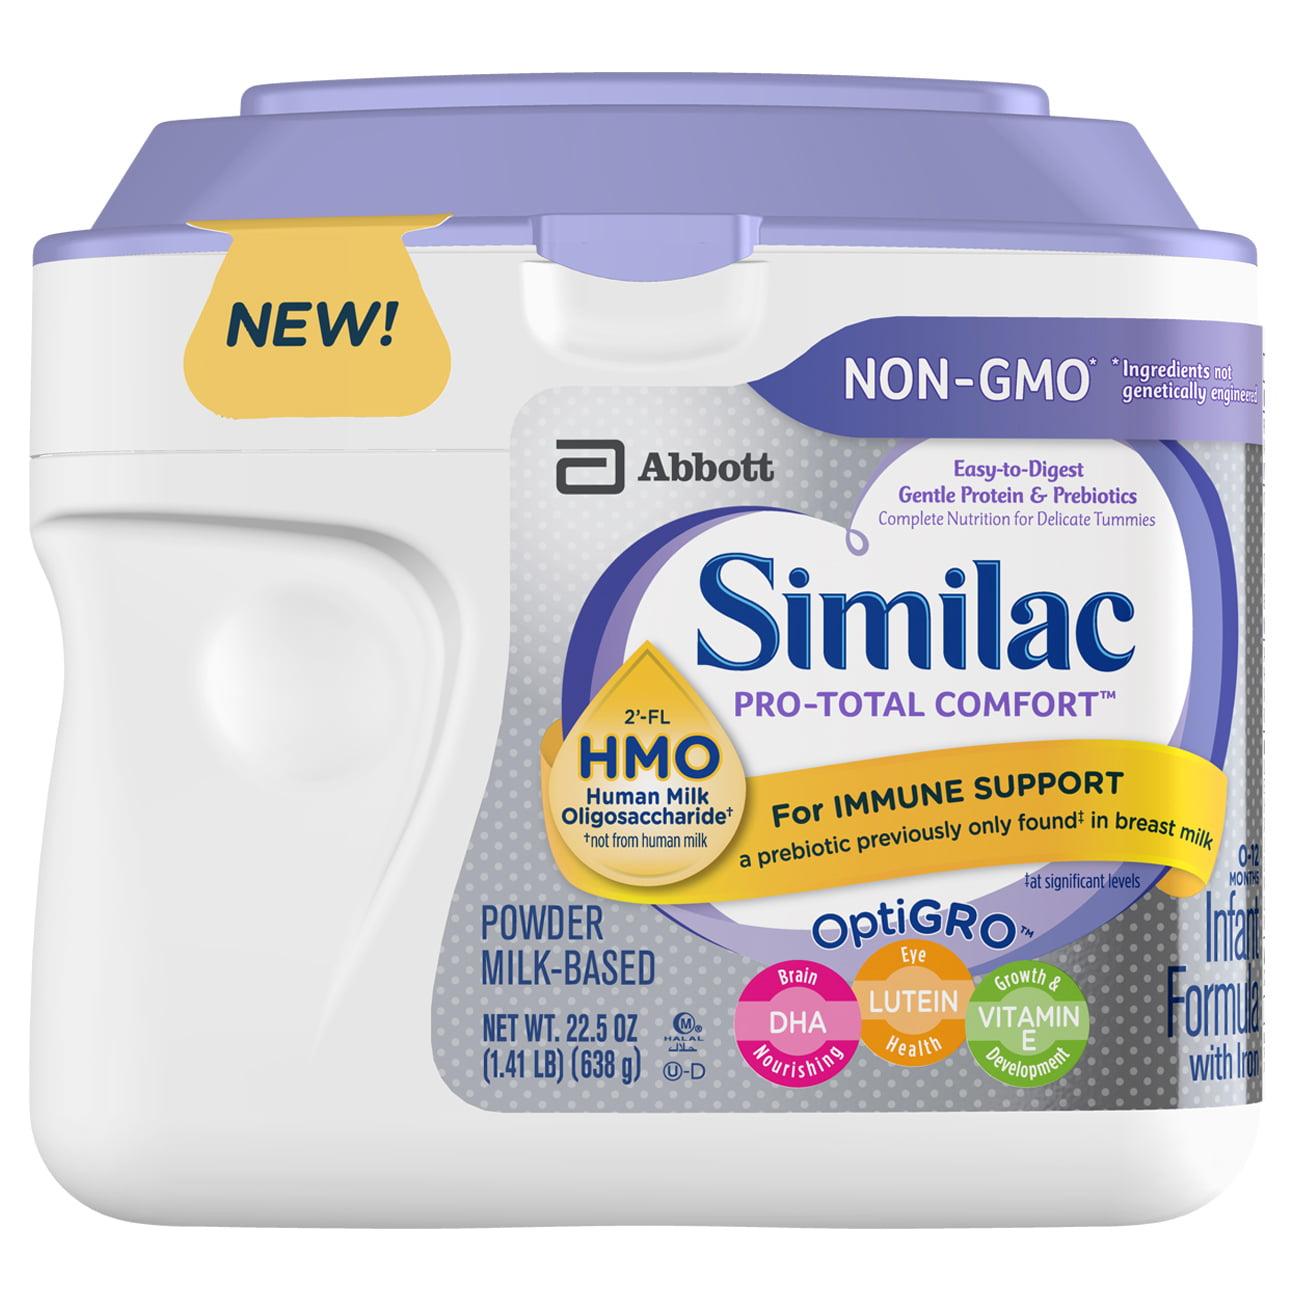 Similac Pro-Total Comfort Non-GMO Infant Formula Powder, 22.5 oz Tub